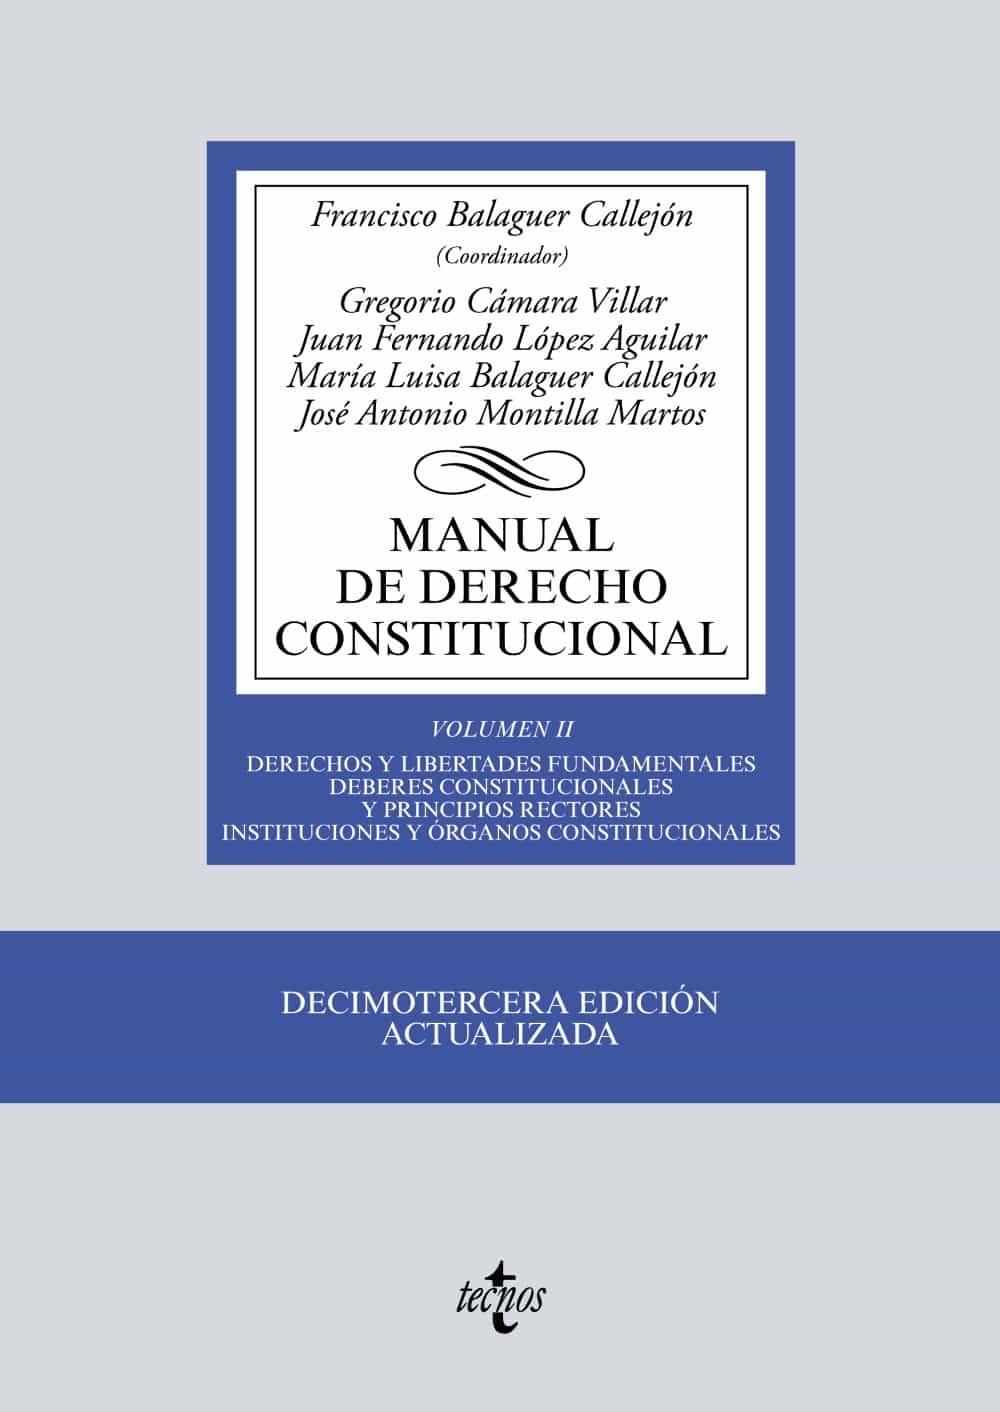 Manual De Derecho Constitucional (vol. Ii) (13ª Ed.) por Francisco Balaguer Callejon